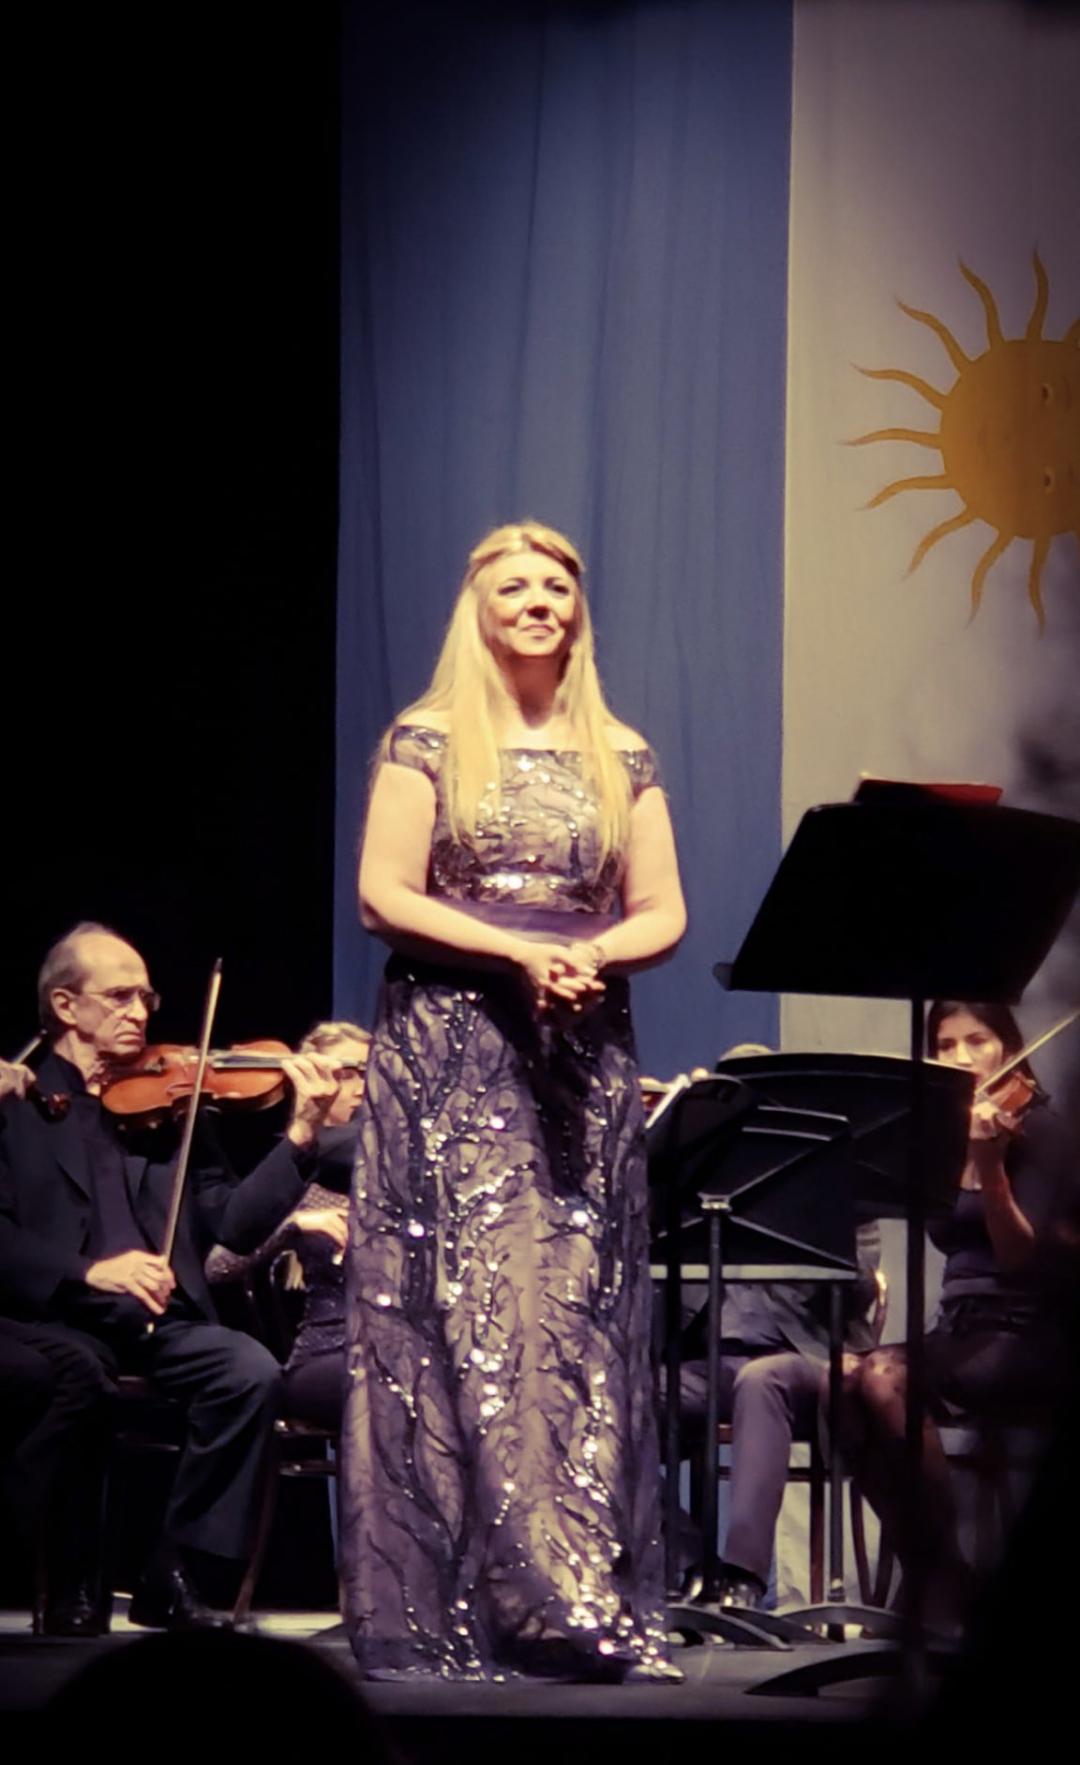 50 aniversario Orquesta de Cámara Municipal